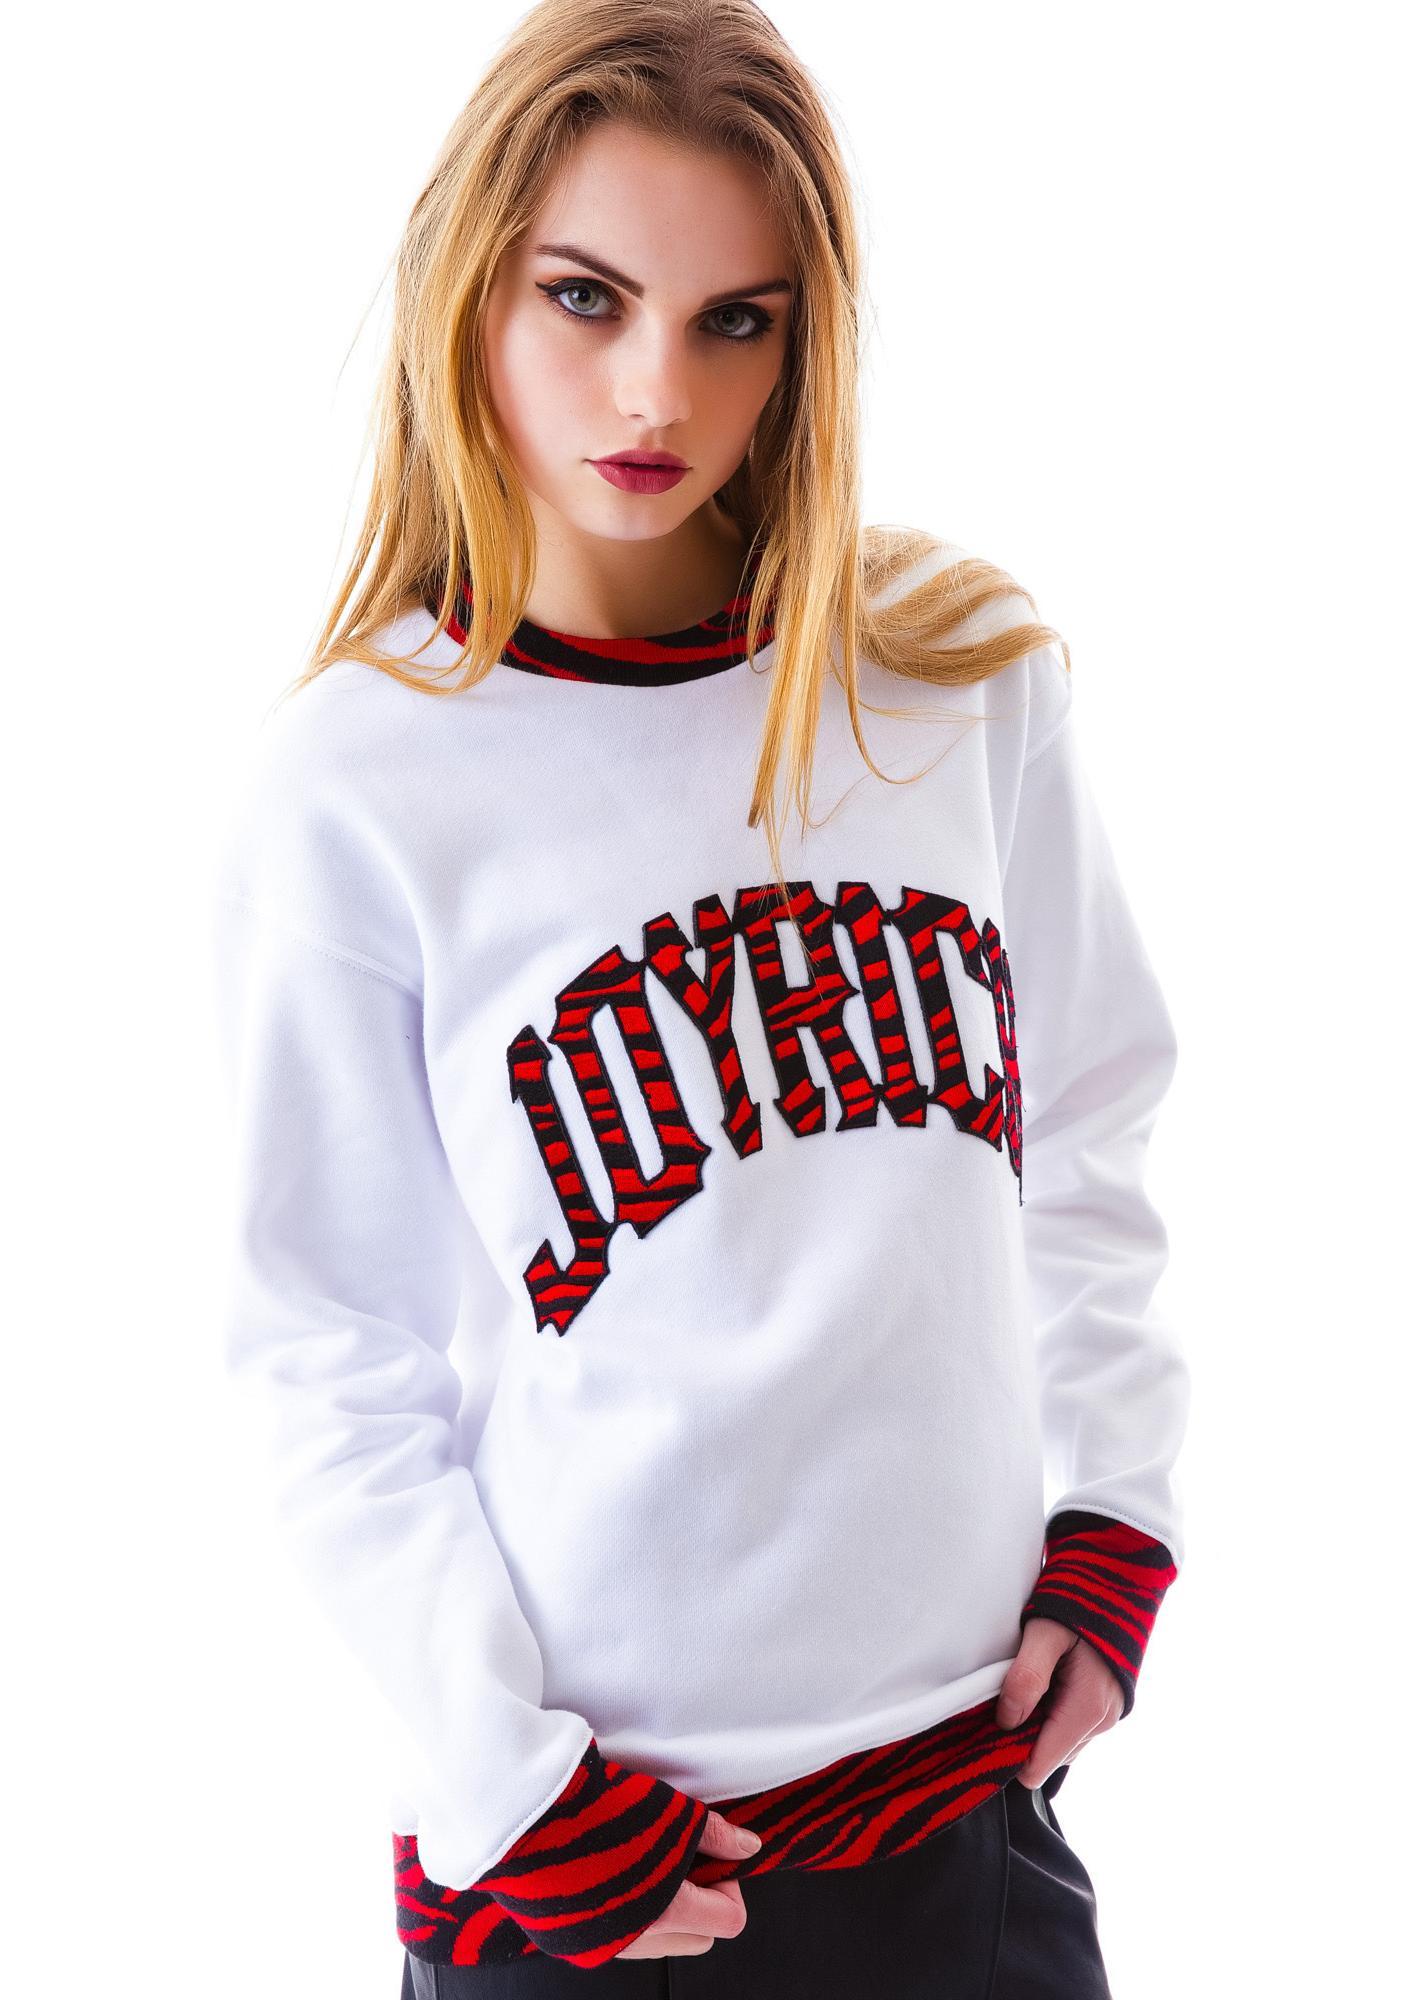 Joyrich Zebra Joyrich Logo Crew Sweatshirt